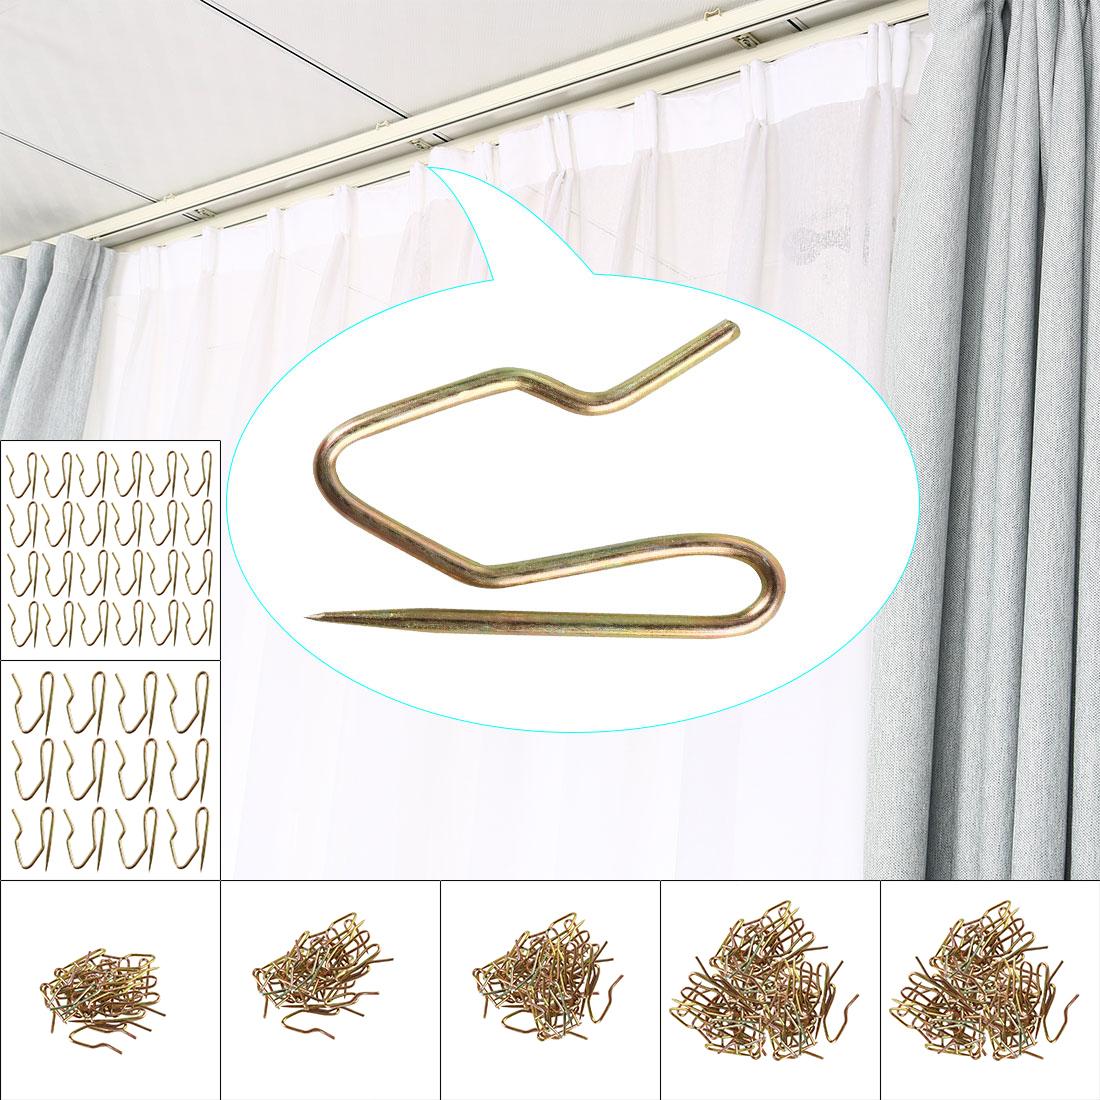 Home Metal Shower Curtain Hook Drapery Hooks Rings Clip Bath